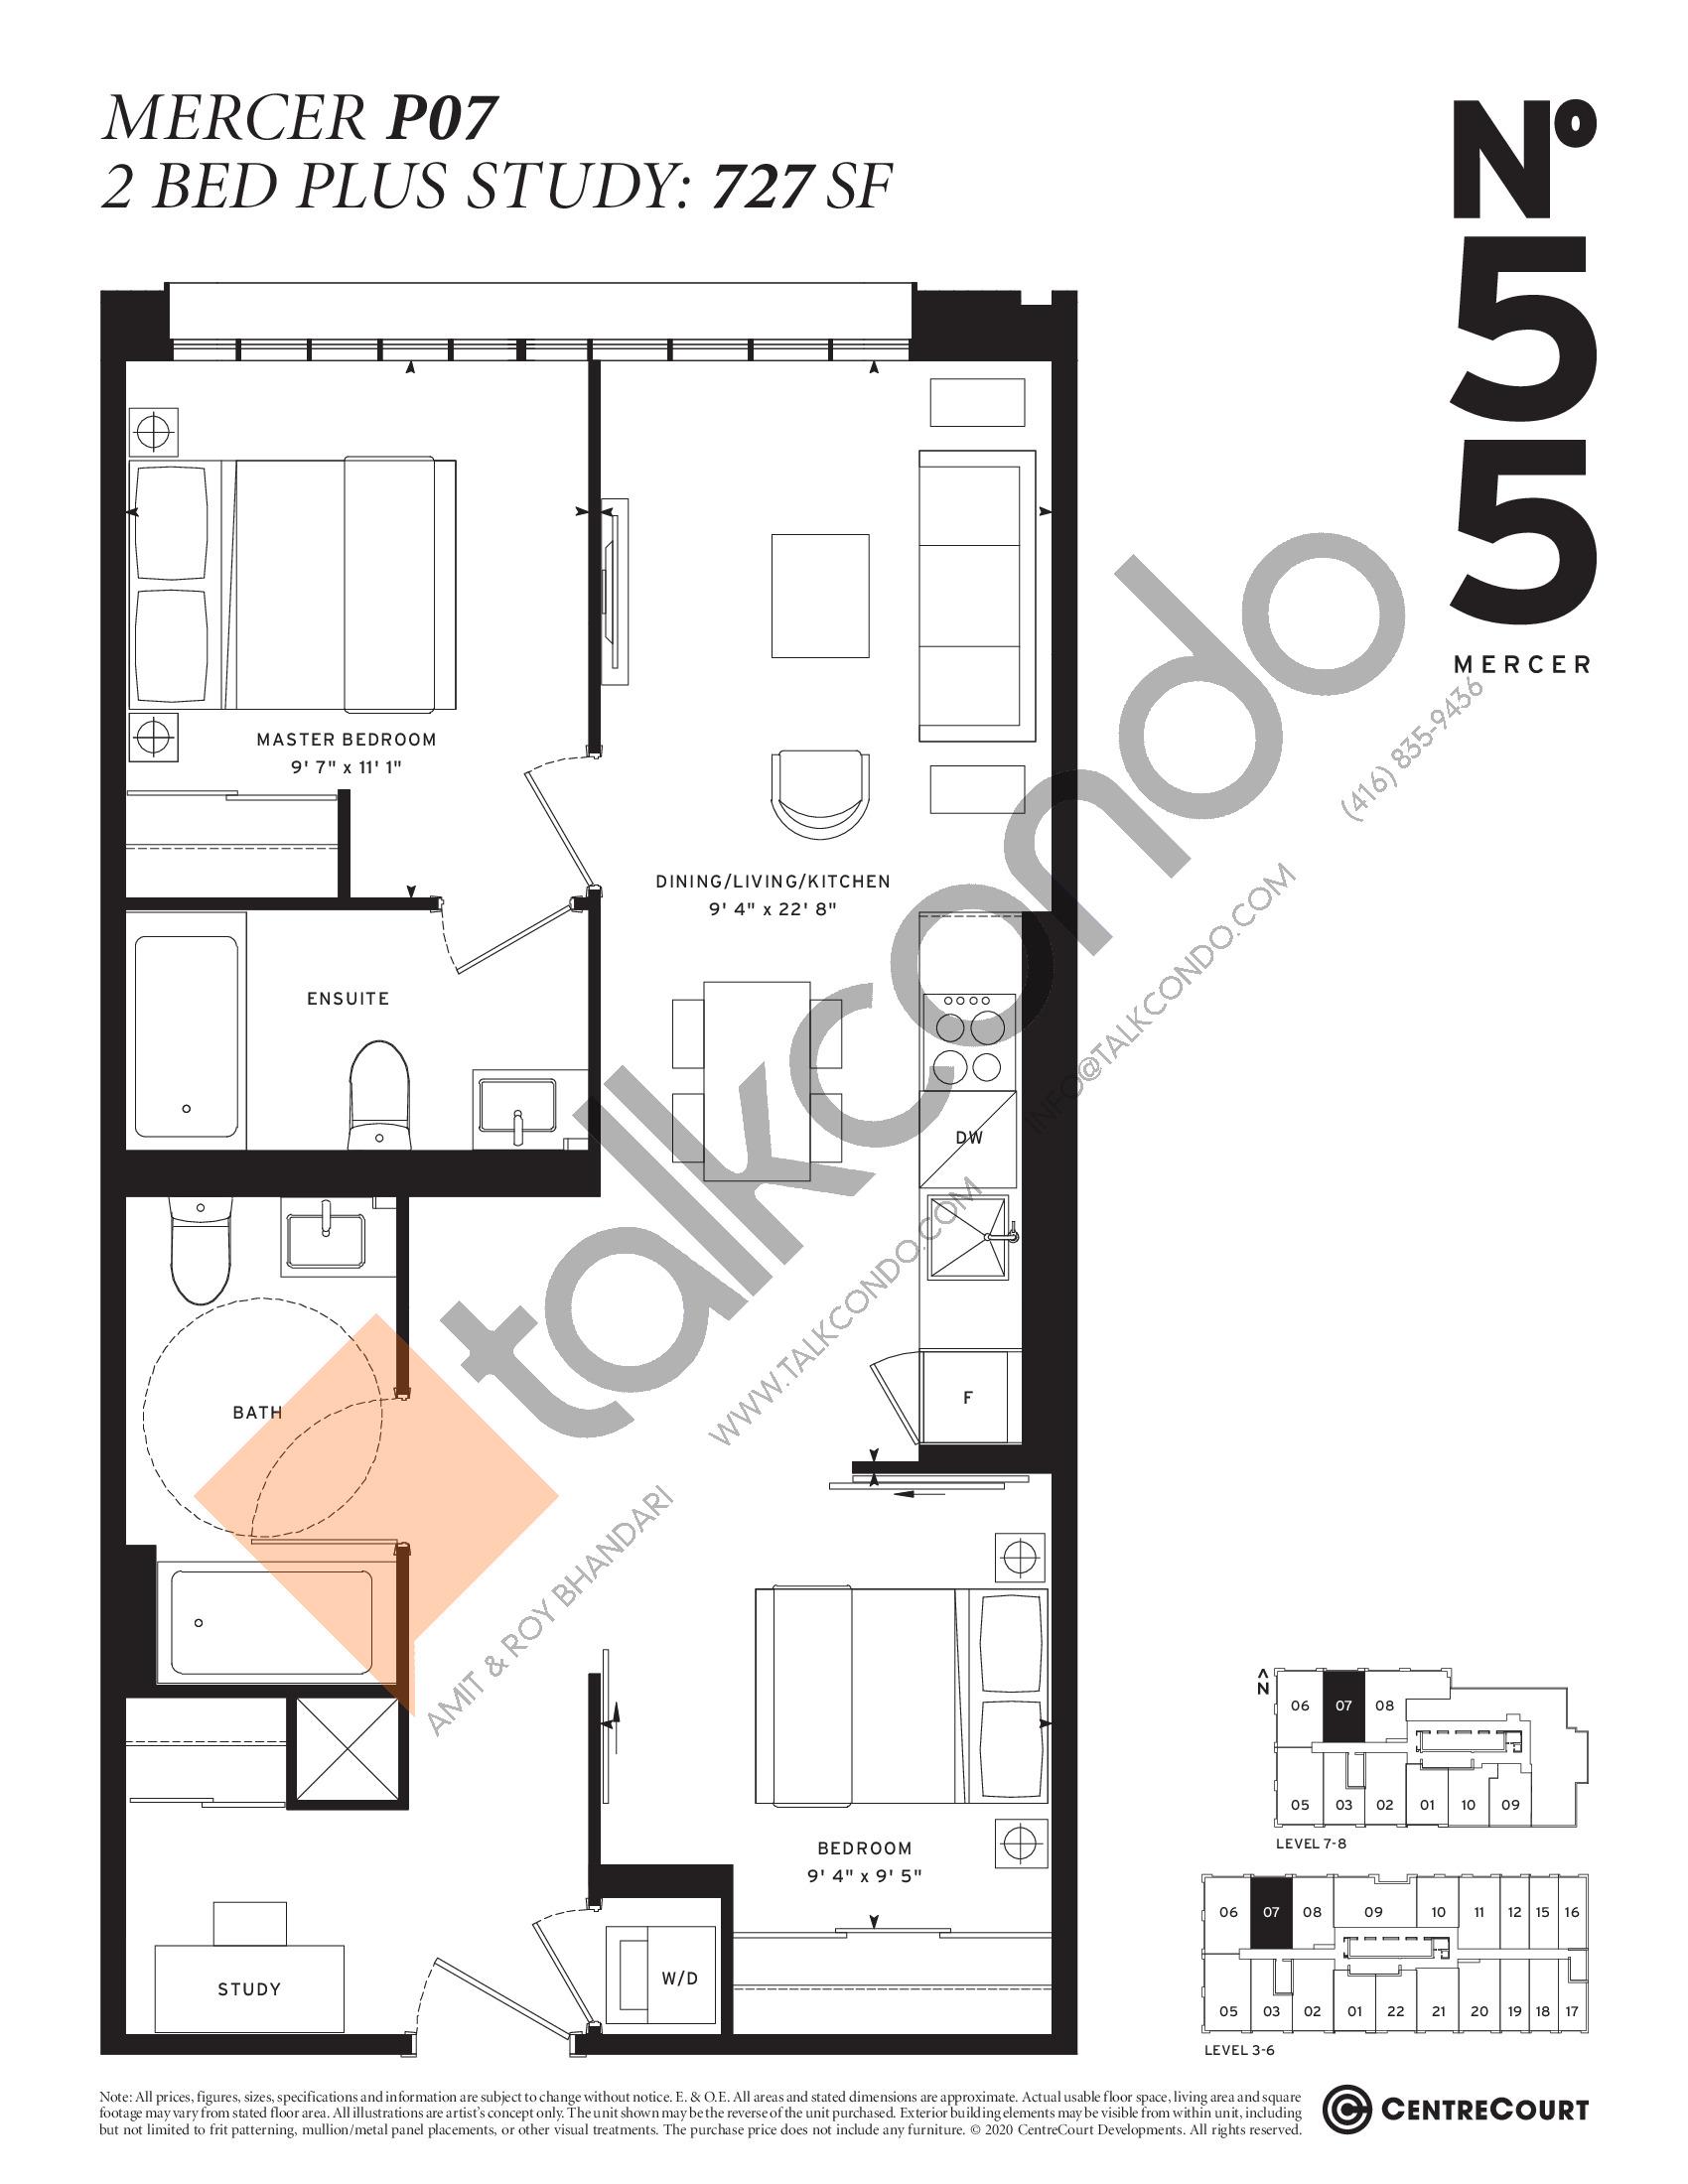 Mercer P07 Floor Plan at No. 55 Mercer Condos - 727 sq.ft